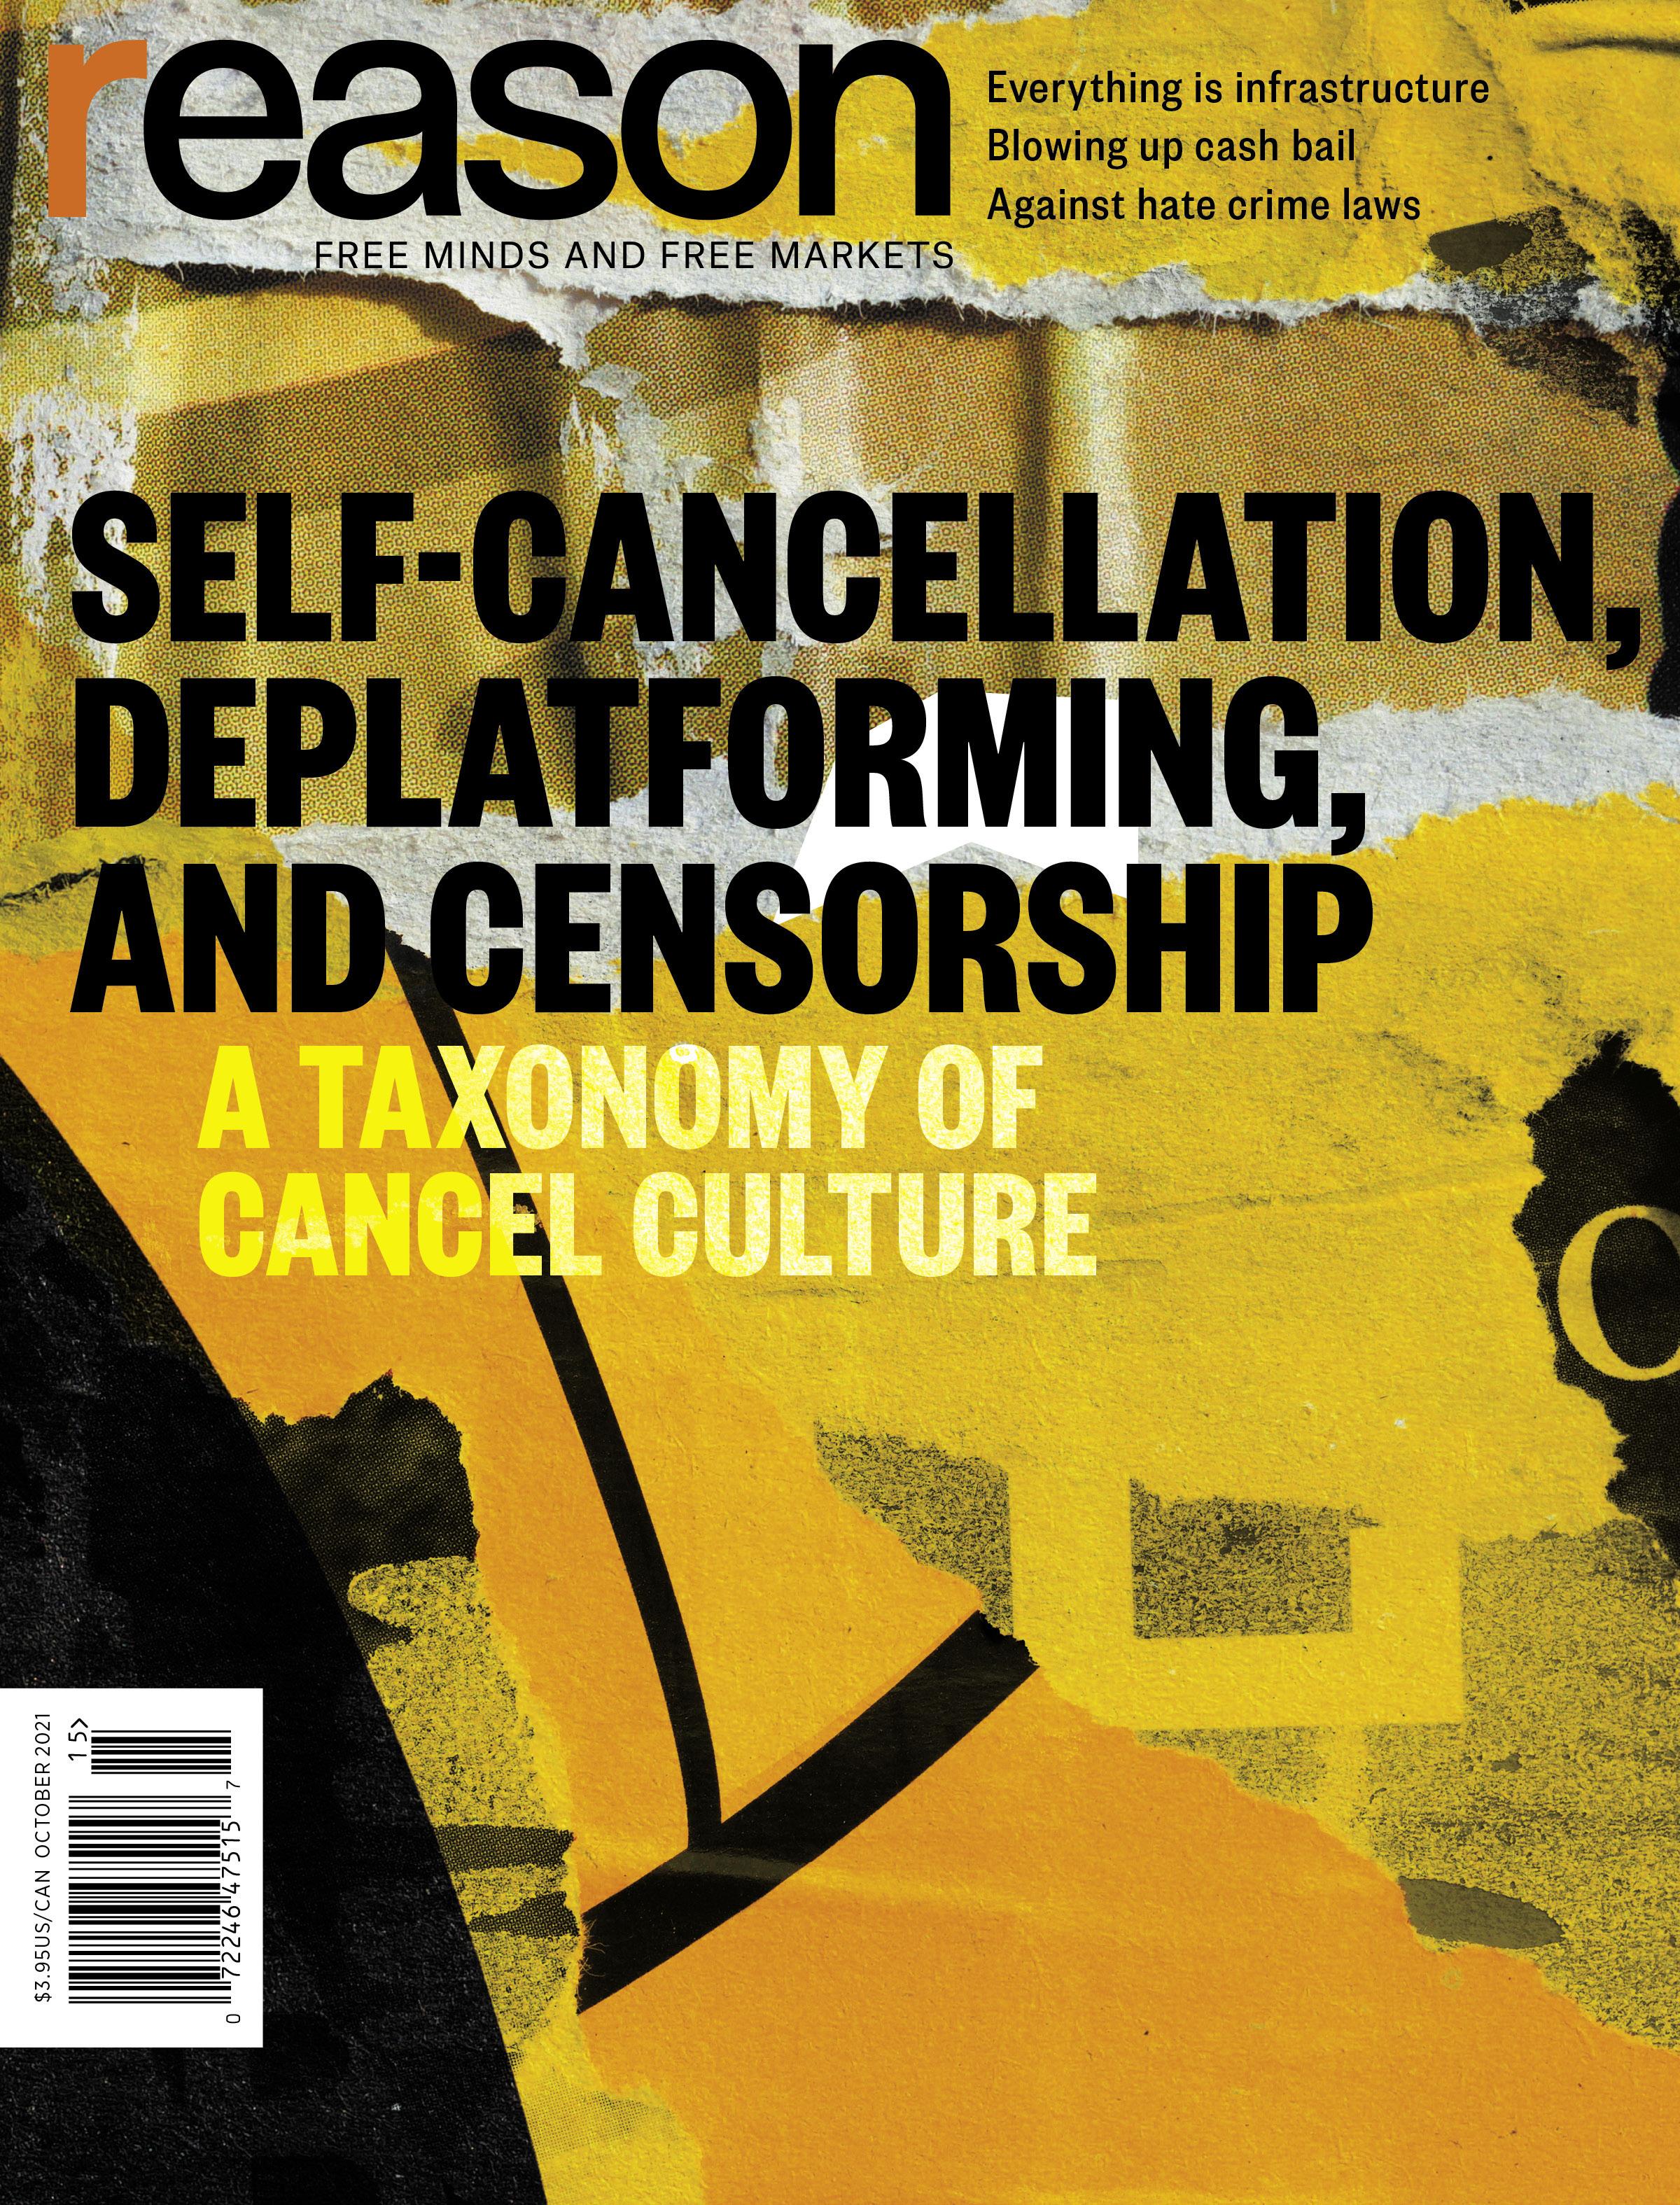 Reason Magazine, October 2021 cover image